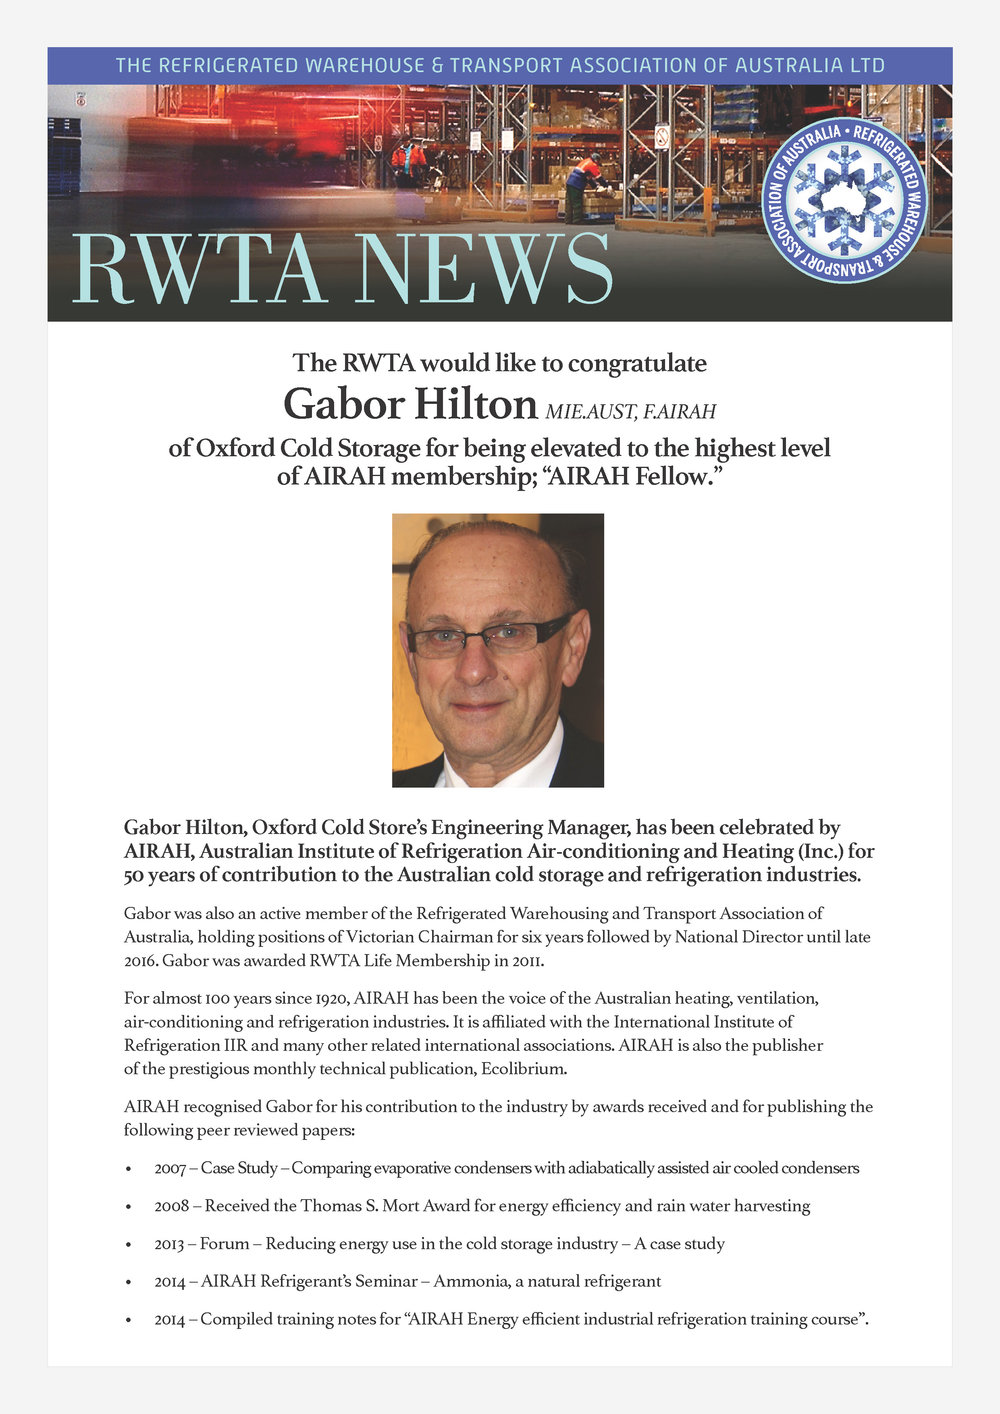 12360_RWTA_Gabor Hilton Flyer_F.jpg